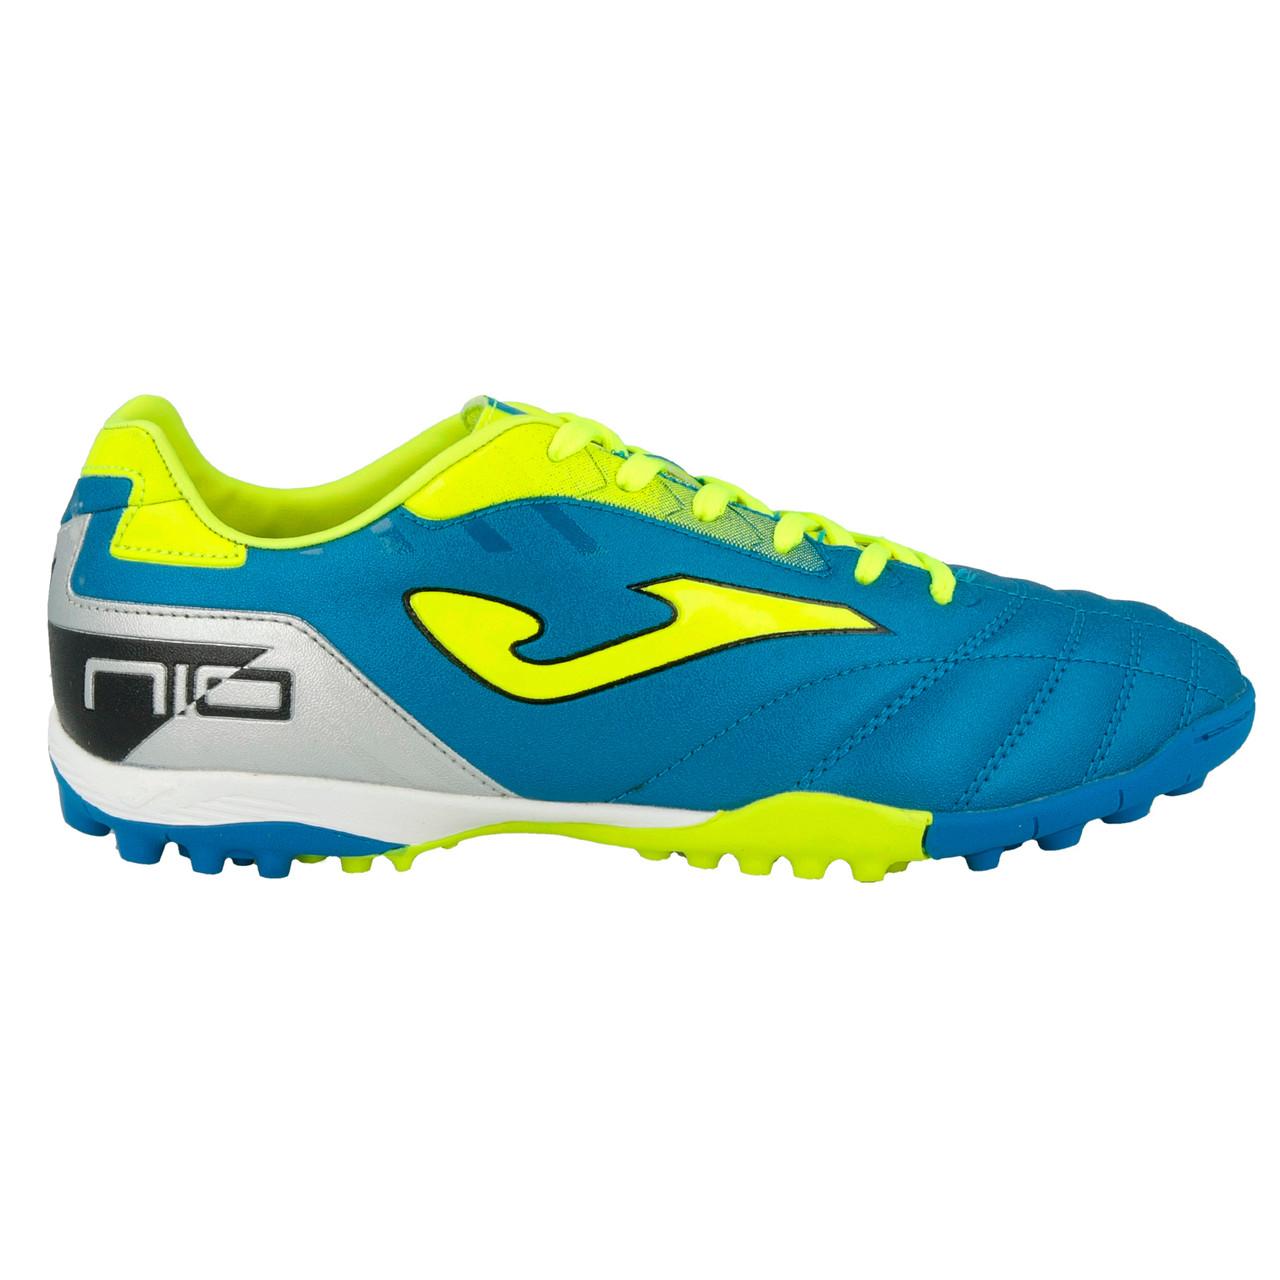 Обувь для футбола (сороканожки) Joma Numero-10 TF , цена 999 грн ... afb9af36815